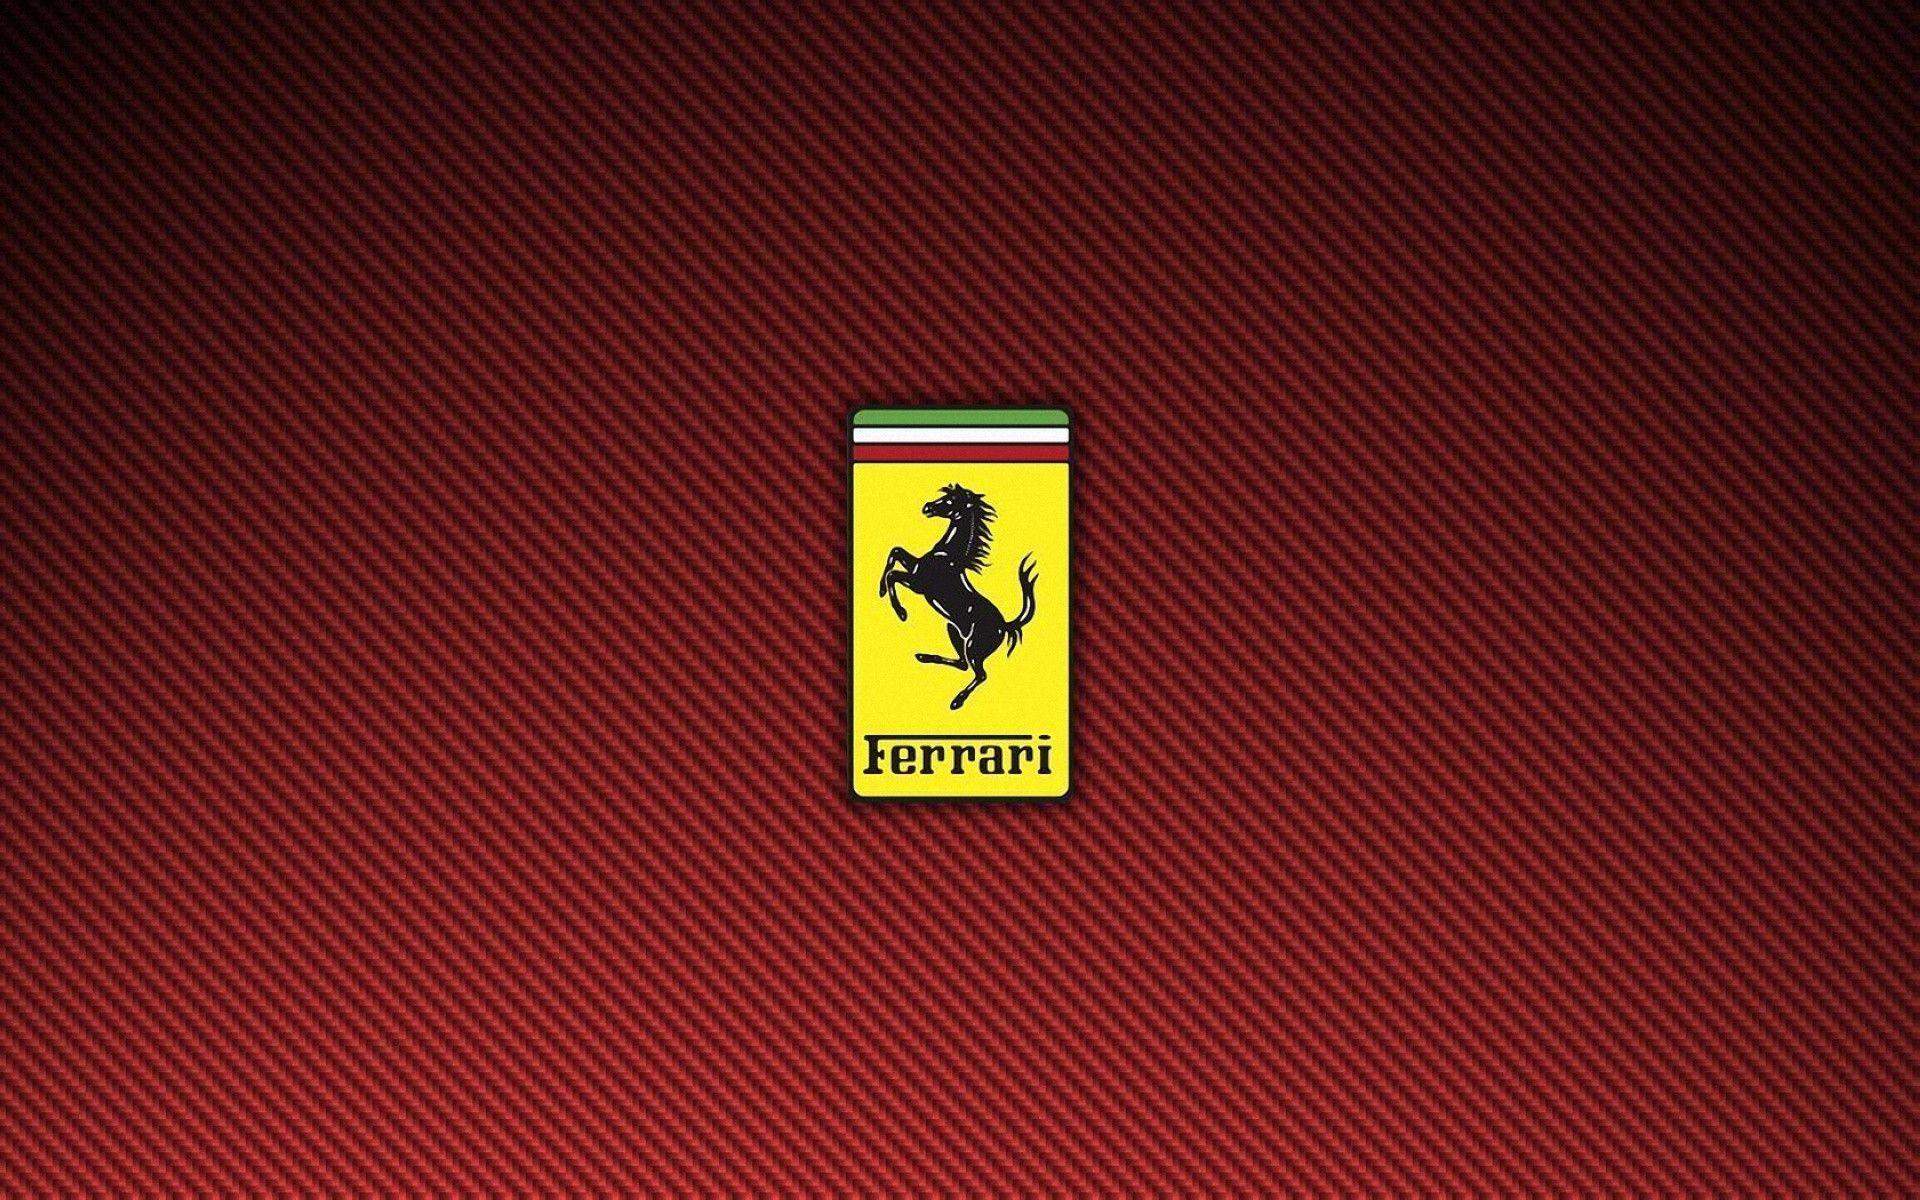 carbon fiber ferrari logo. ferrari logo 05 wallpapers hd. ferrari .